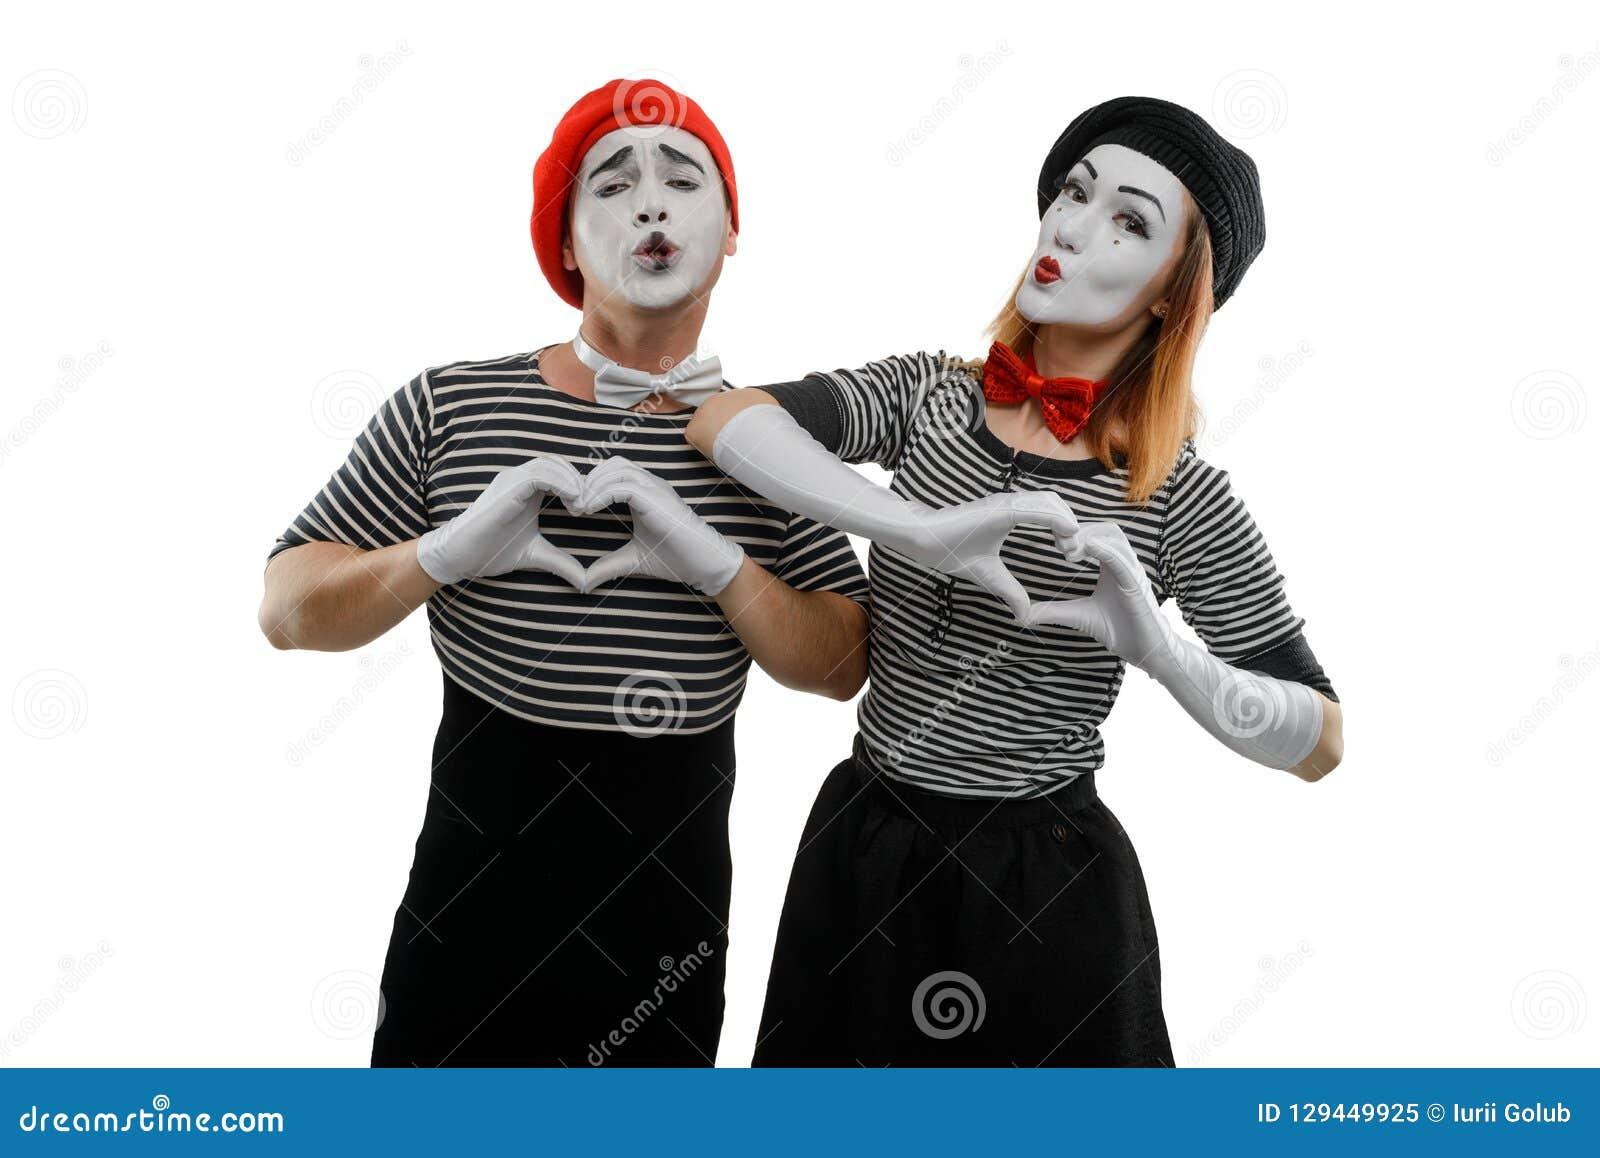 Love Scene Of Pantomime Actors Stock Image - Image of look